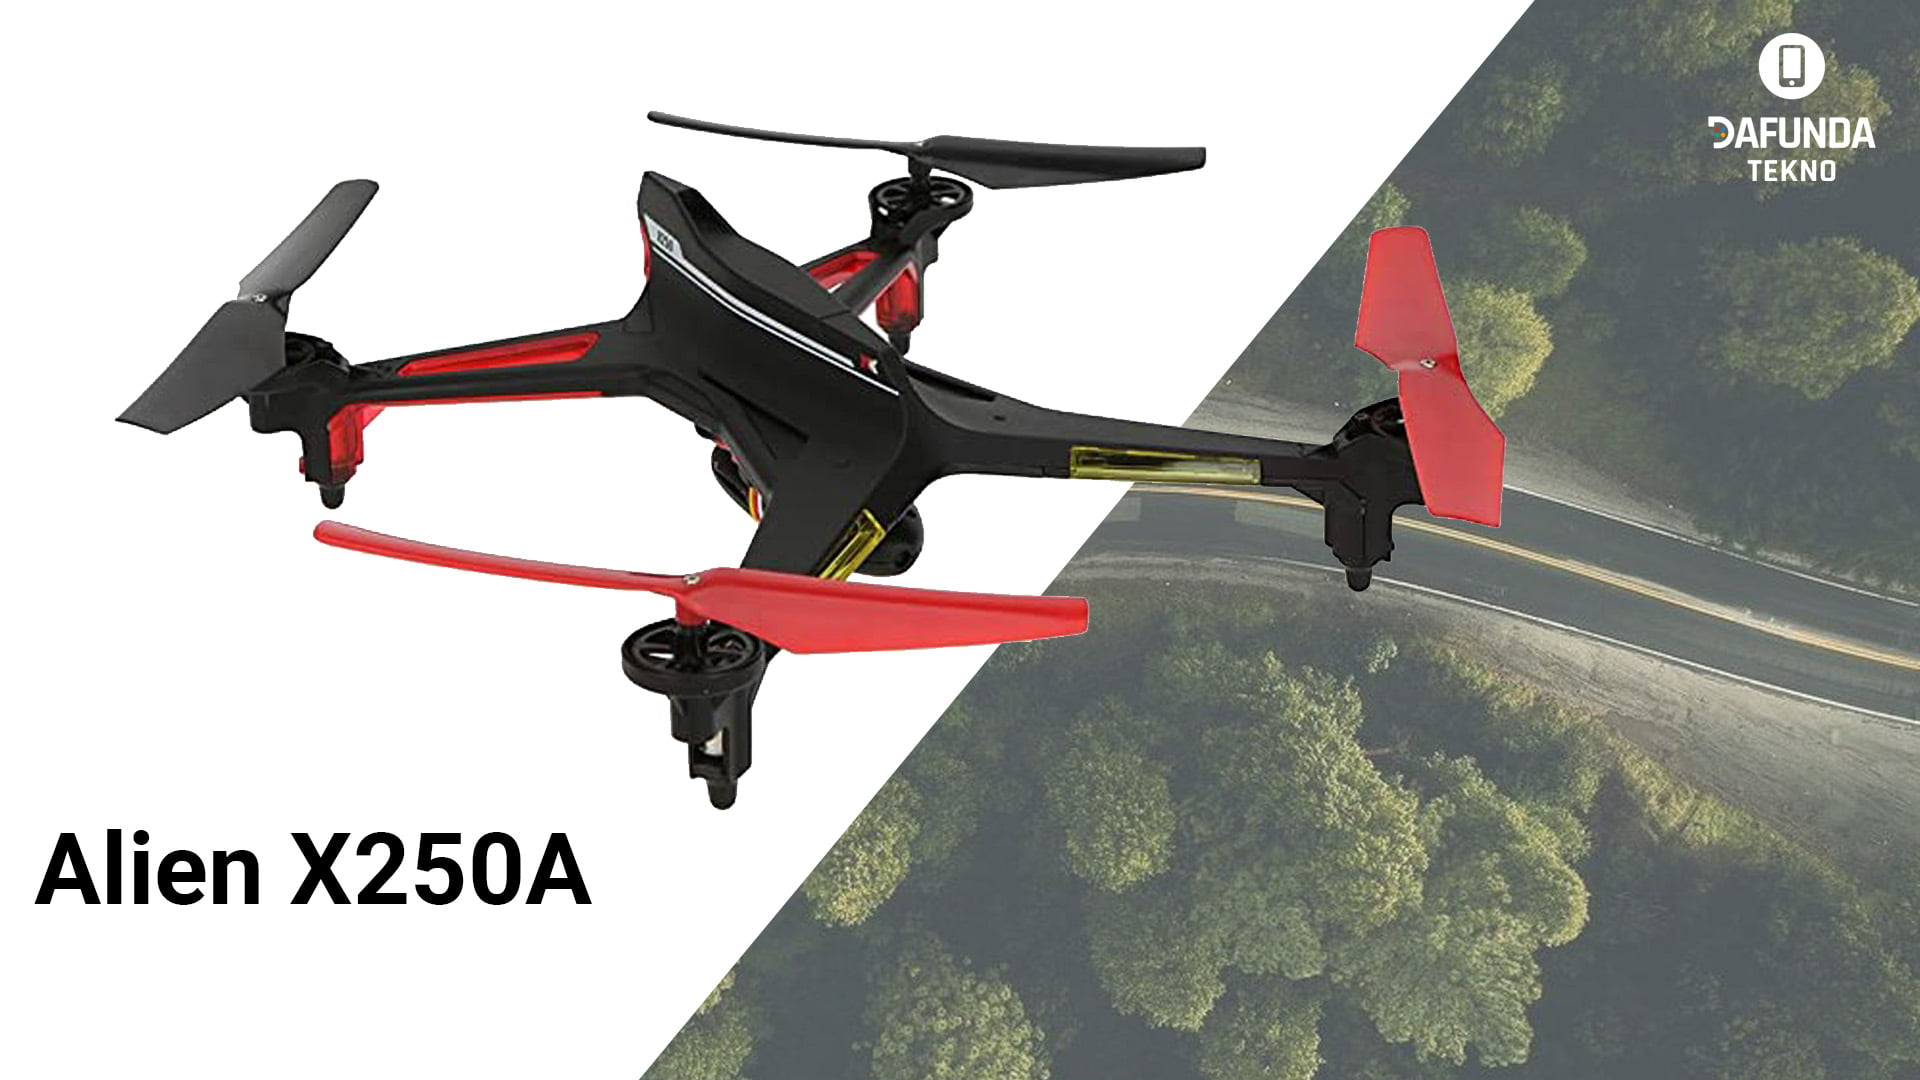 Drone Murah Terbaik Harga dibawah 2 Jutaan Alien X250a 1